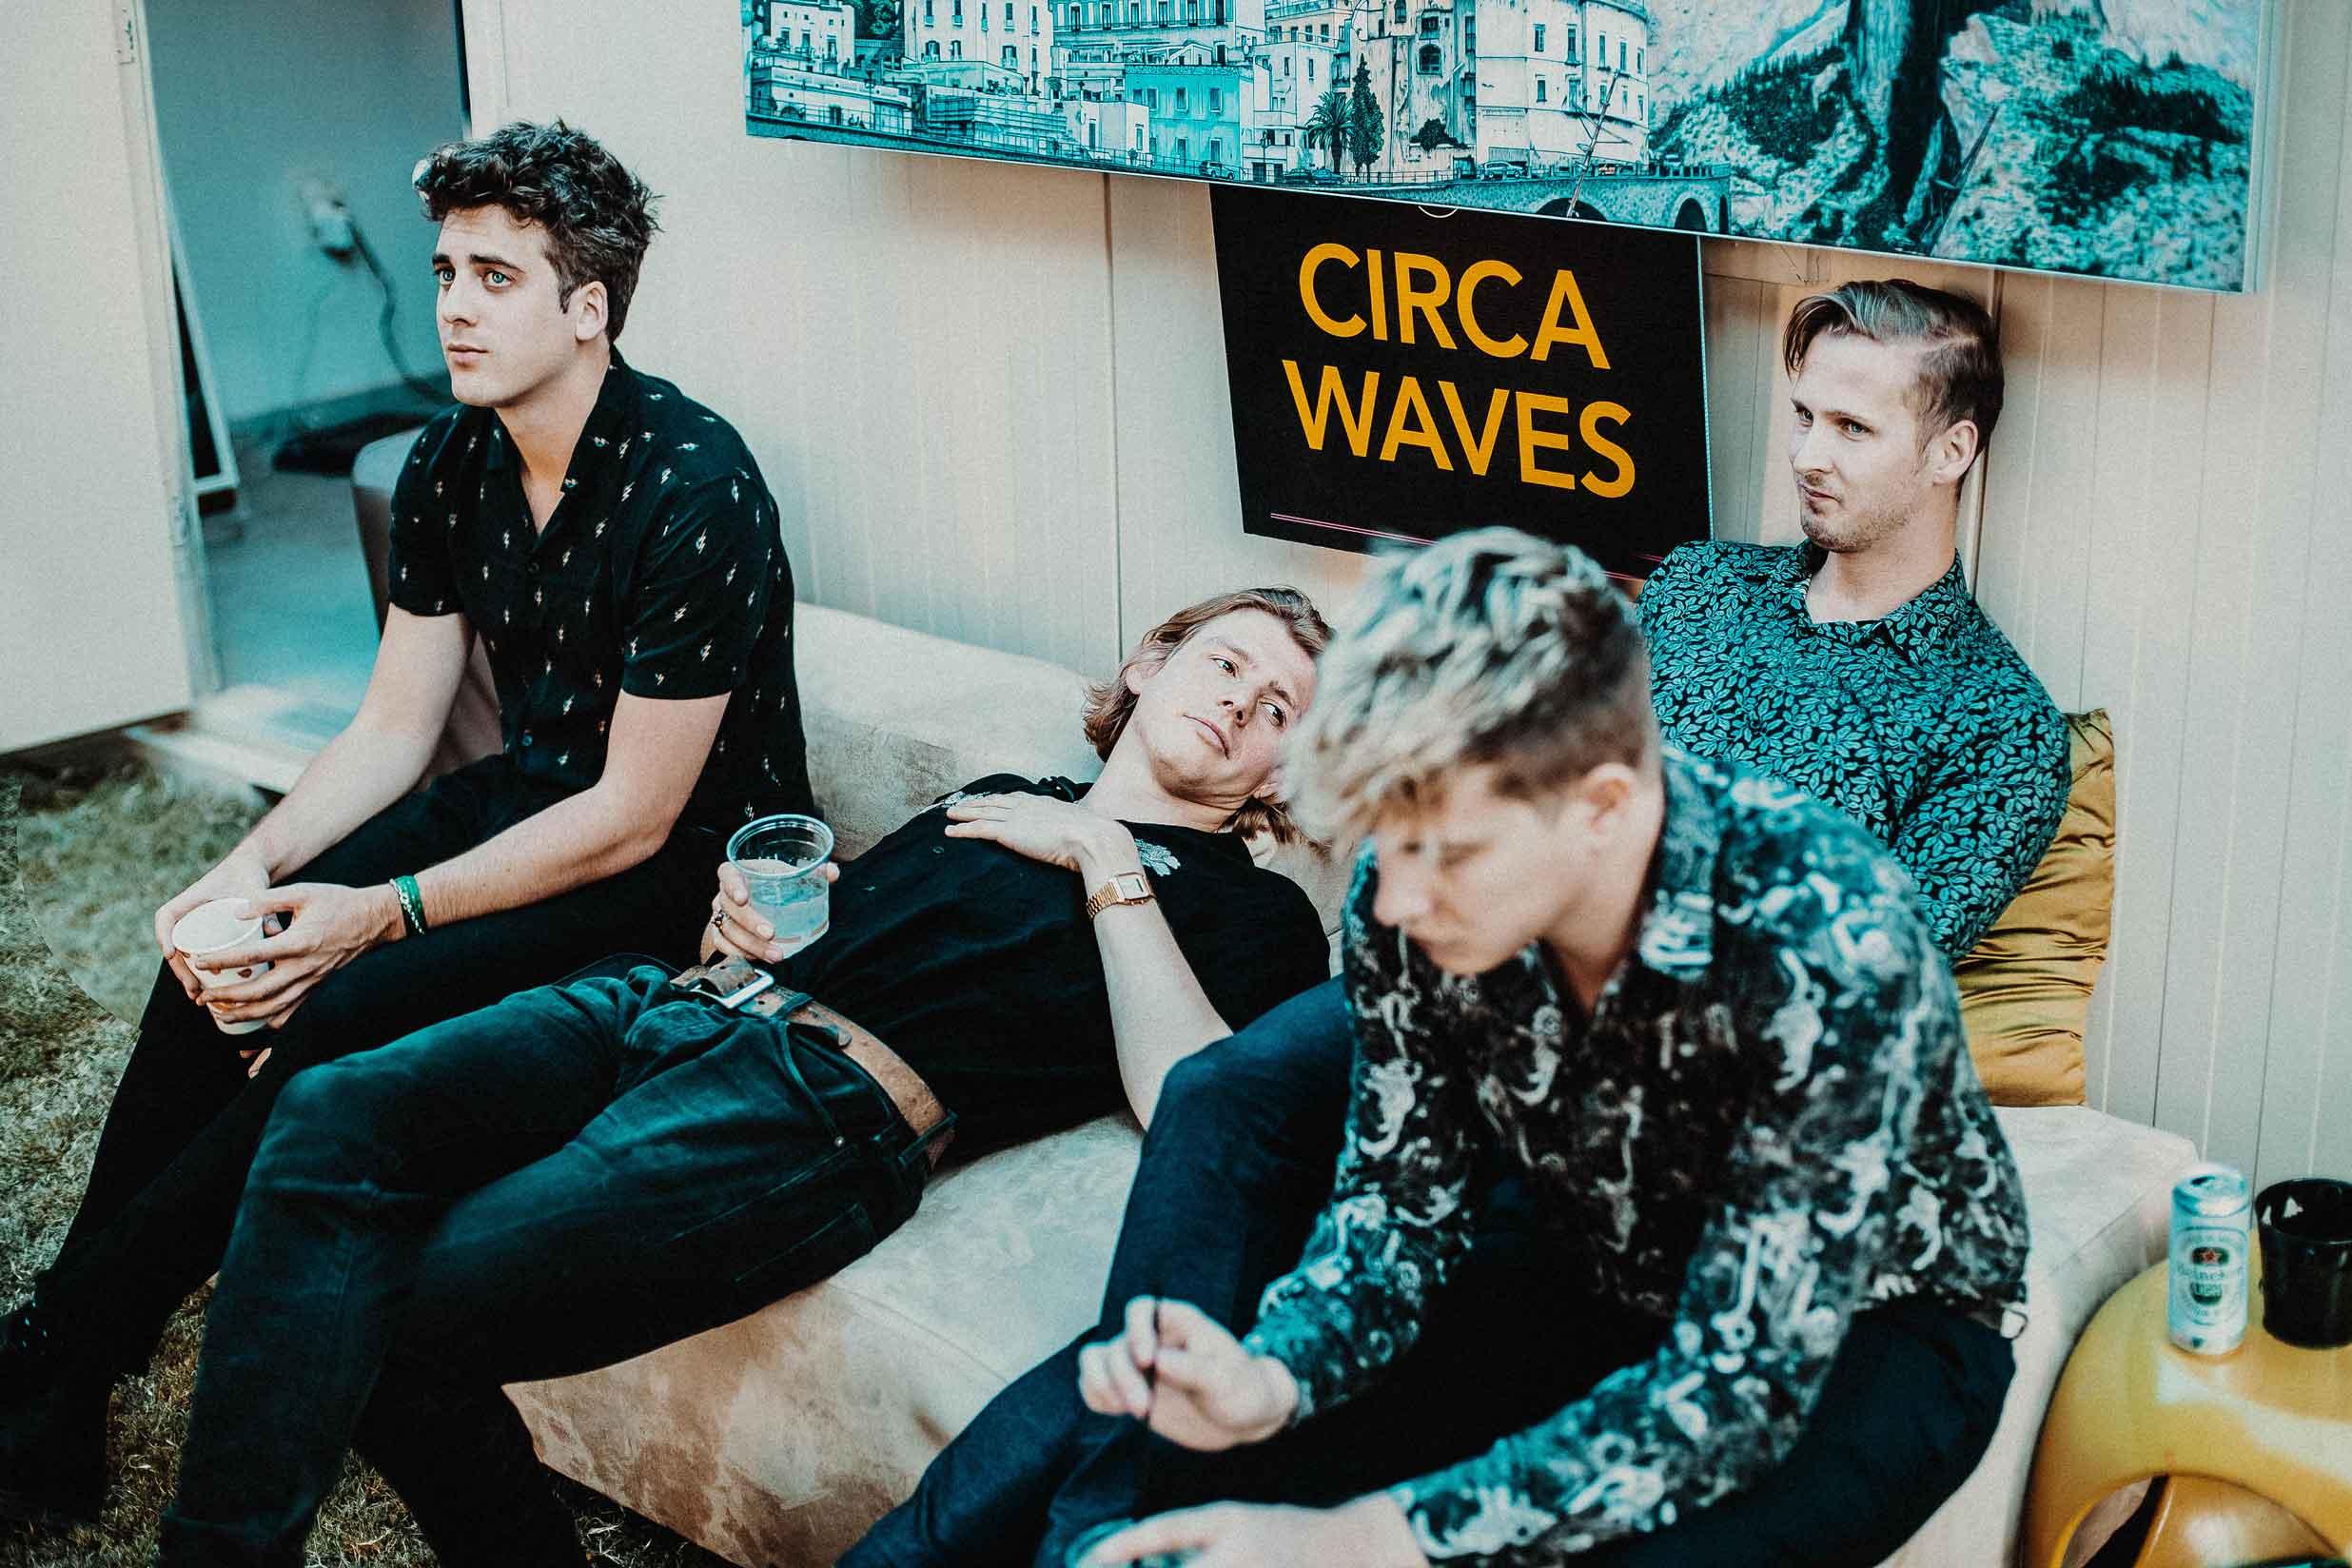 CIRCA WAVES - LAS VEGAS